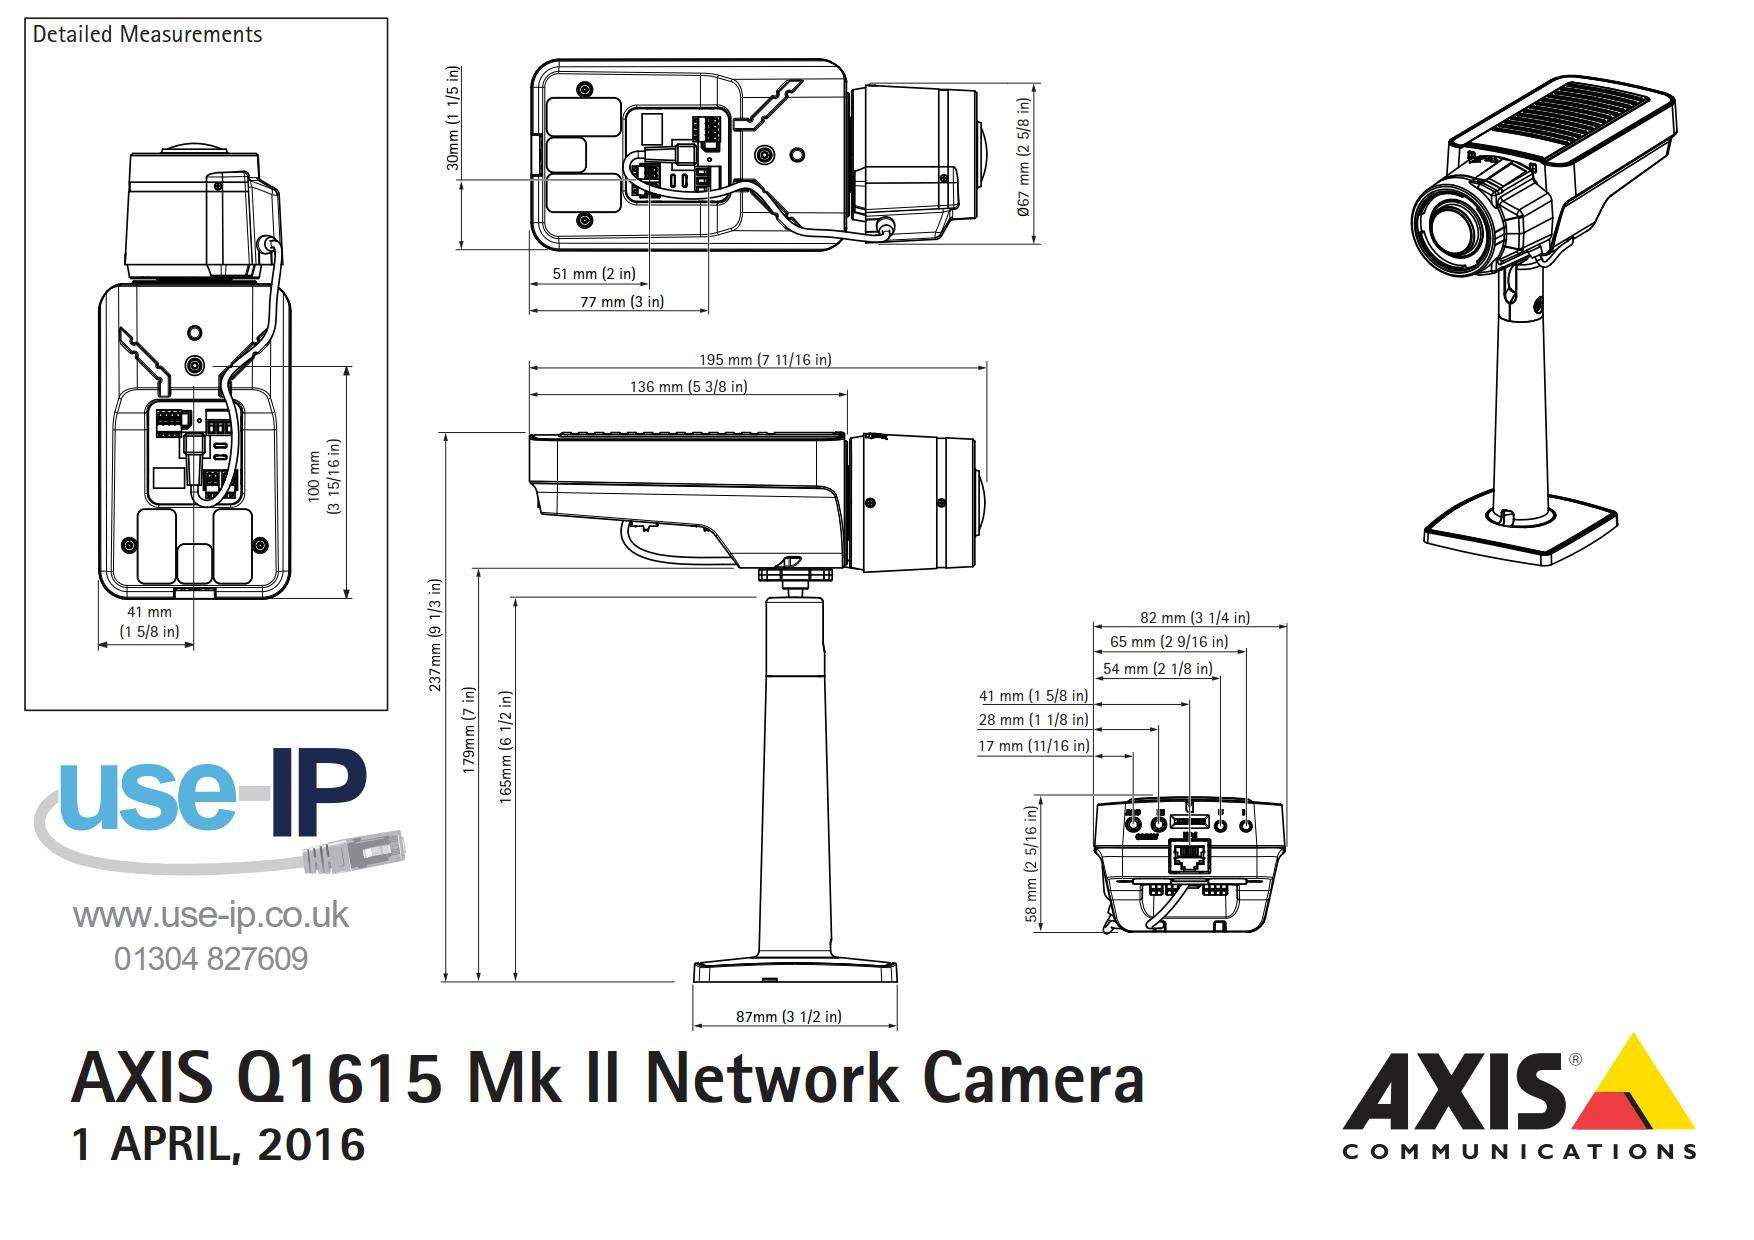 Q1615 Mk II